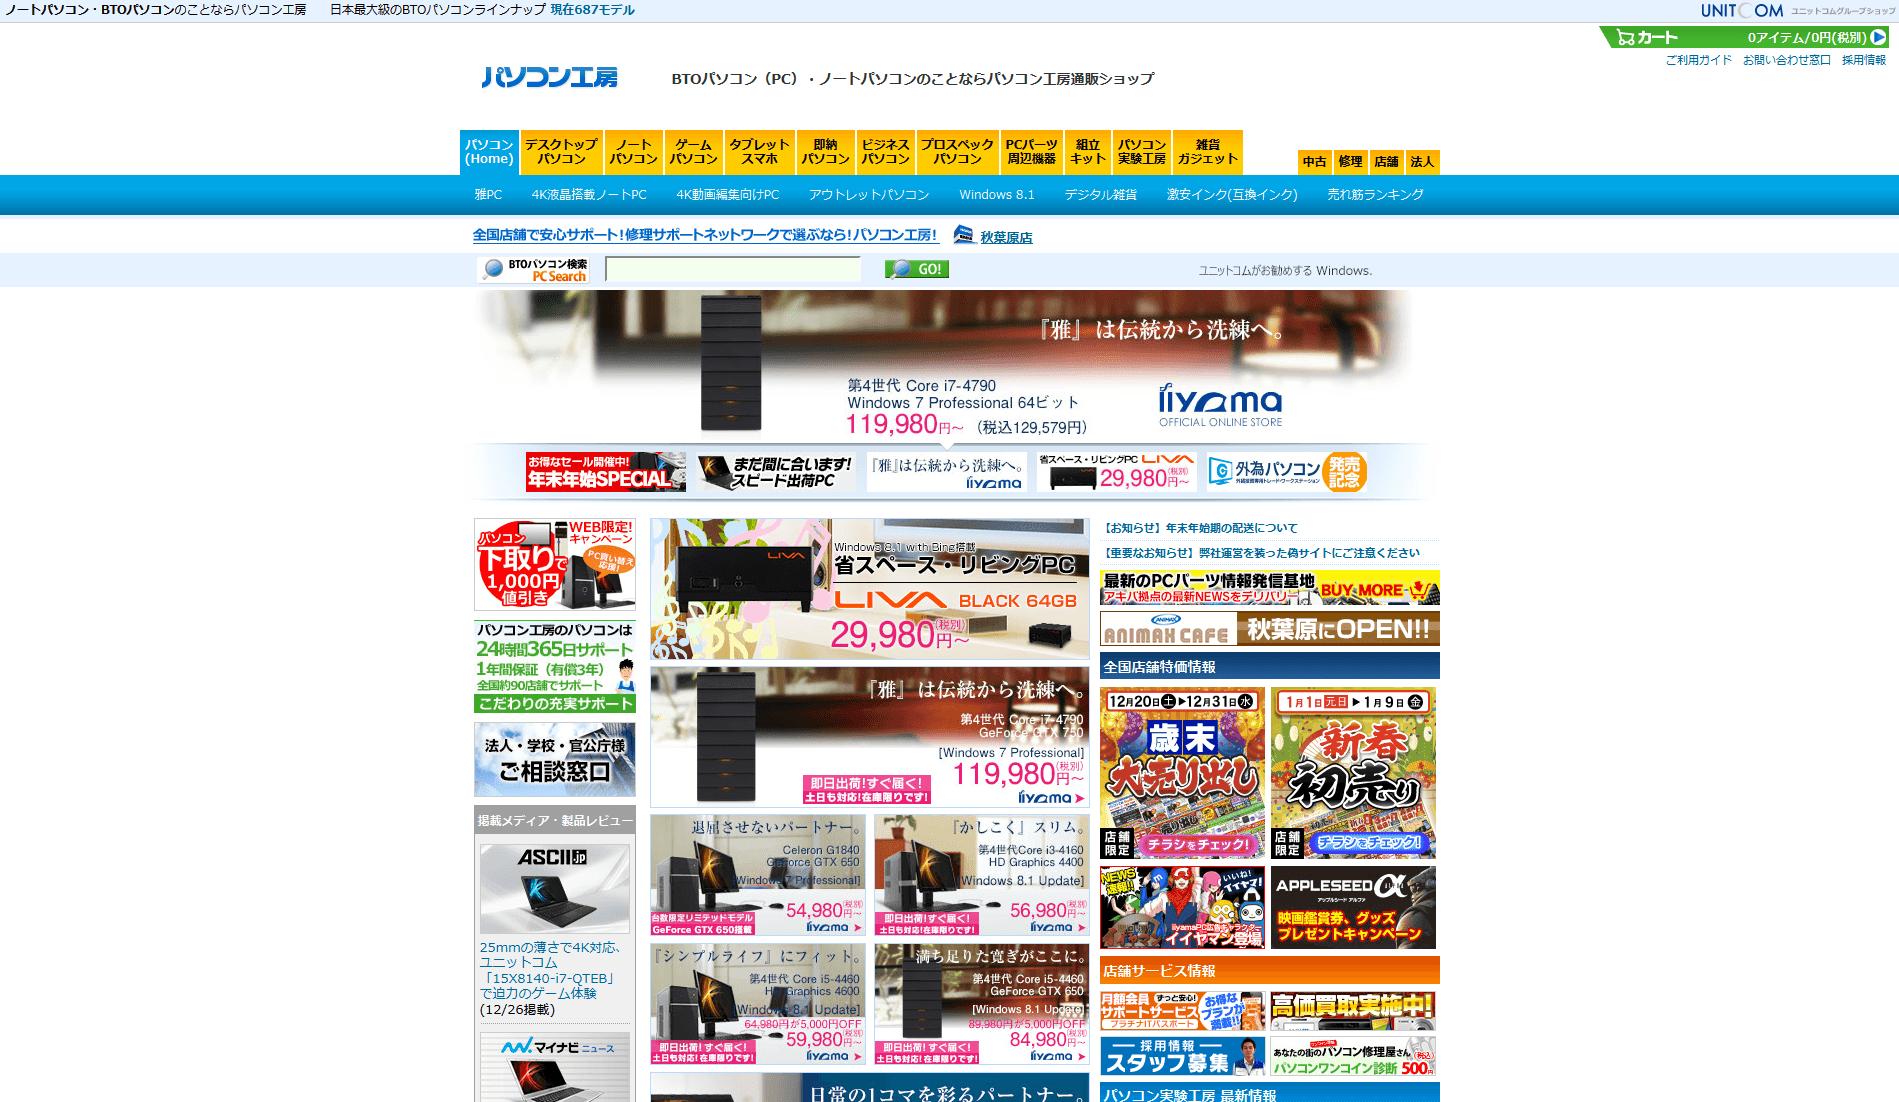 BTOパソコン(PC)・ノートパソコンのことならパソコン工房【公式通販サイト】